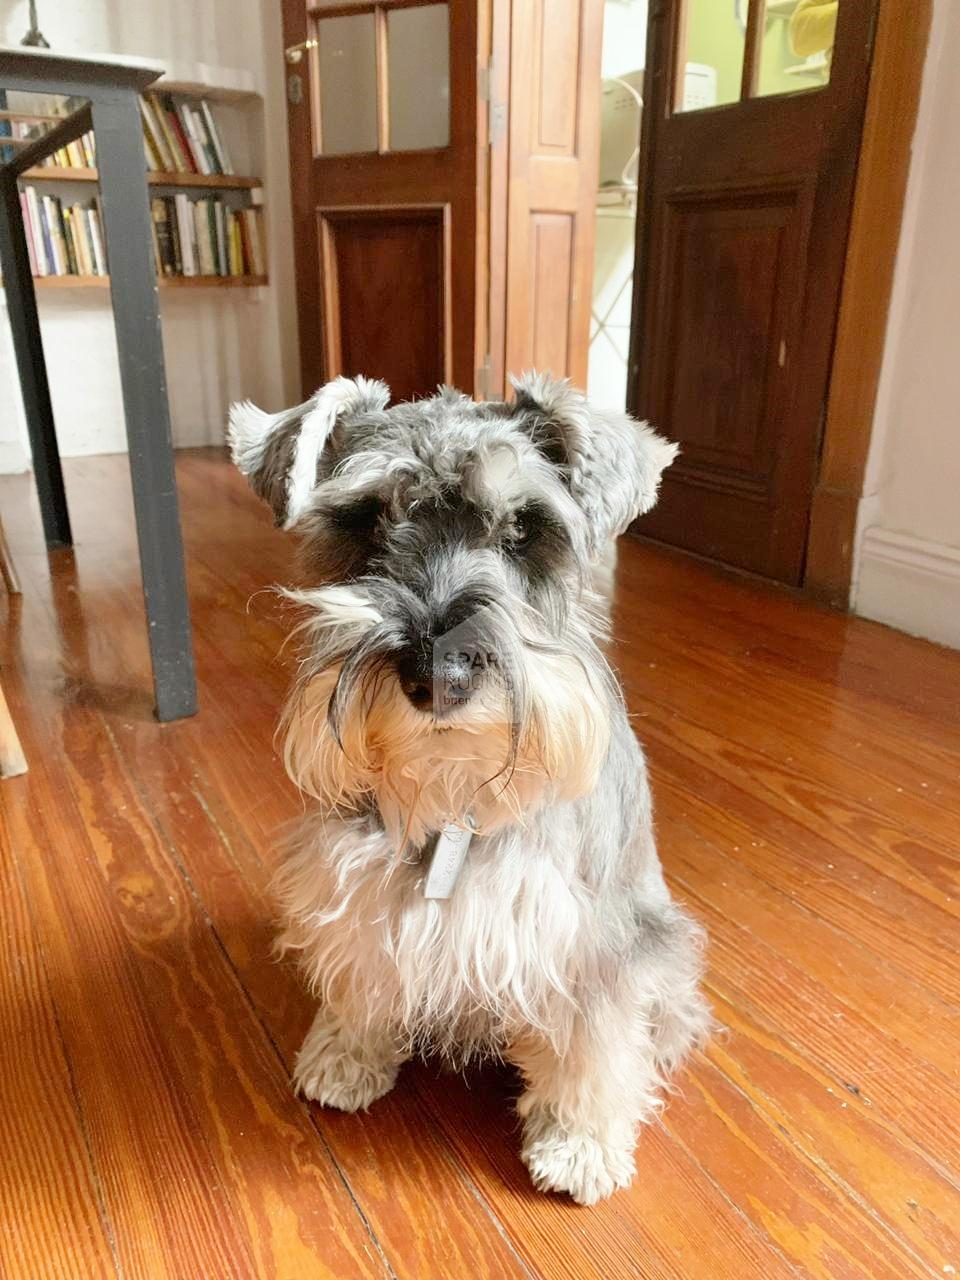 The Dog Simon